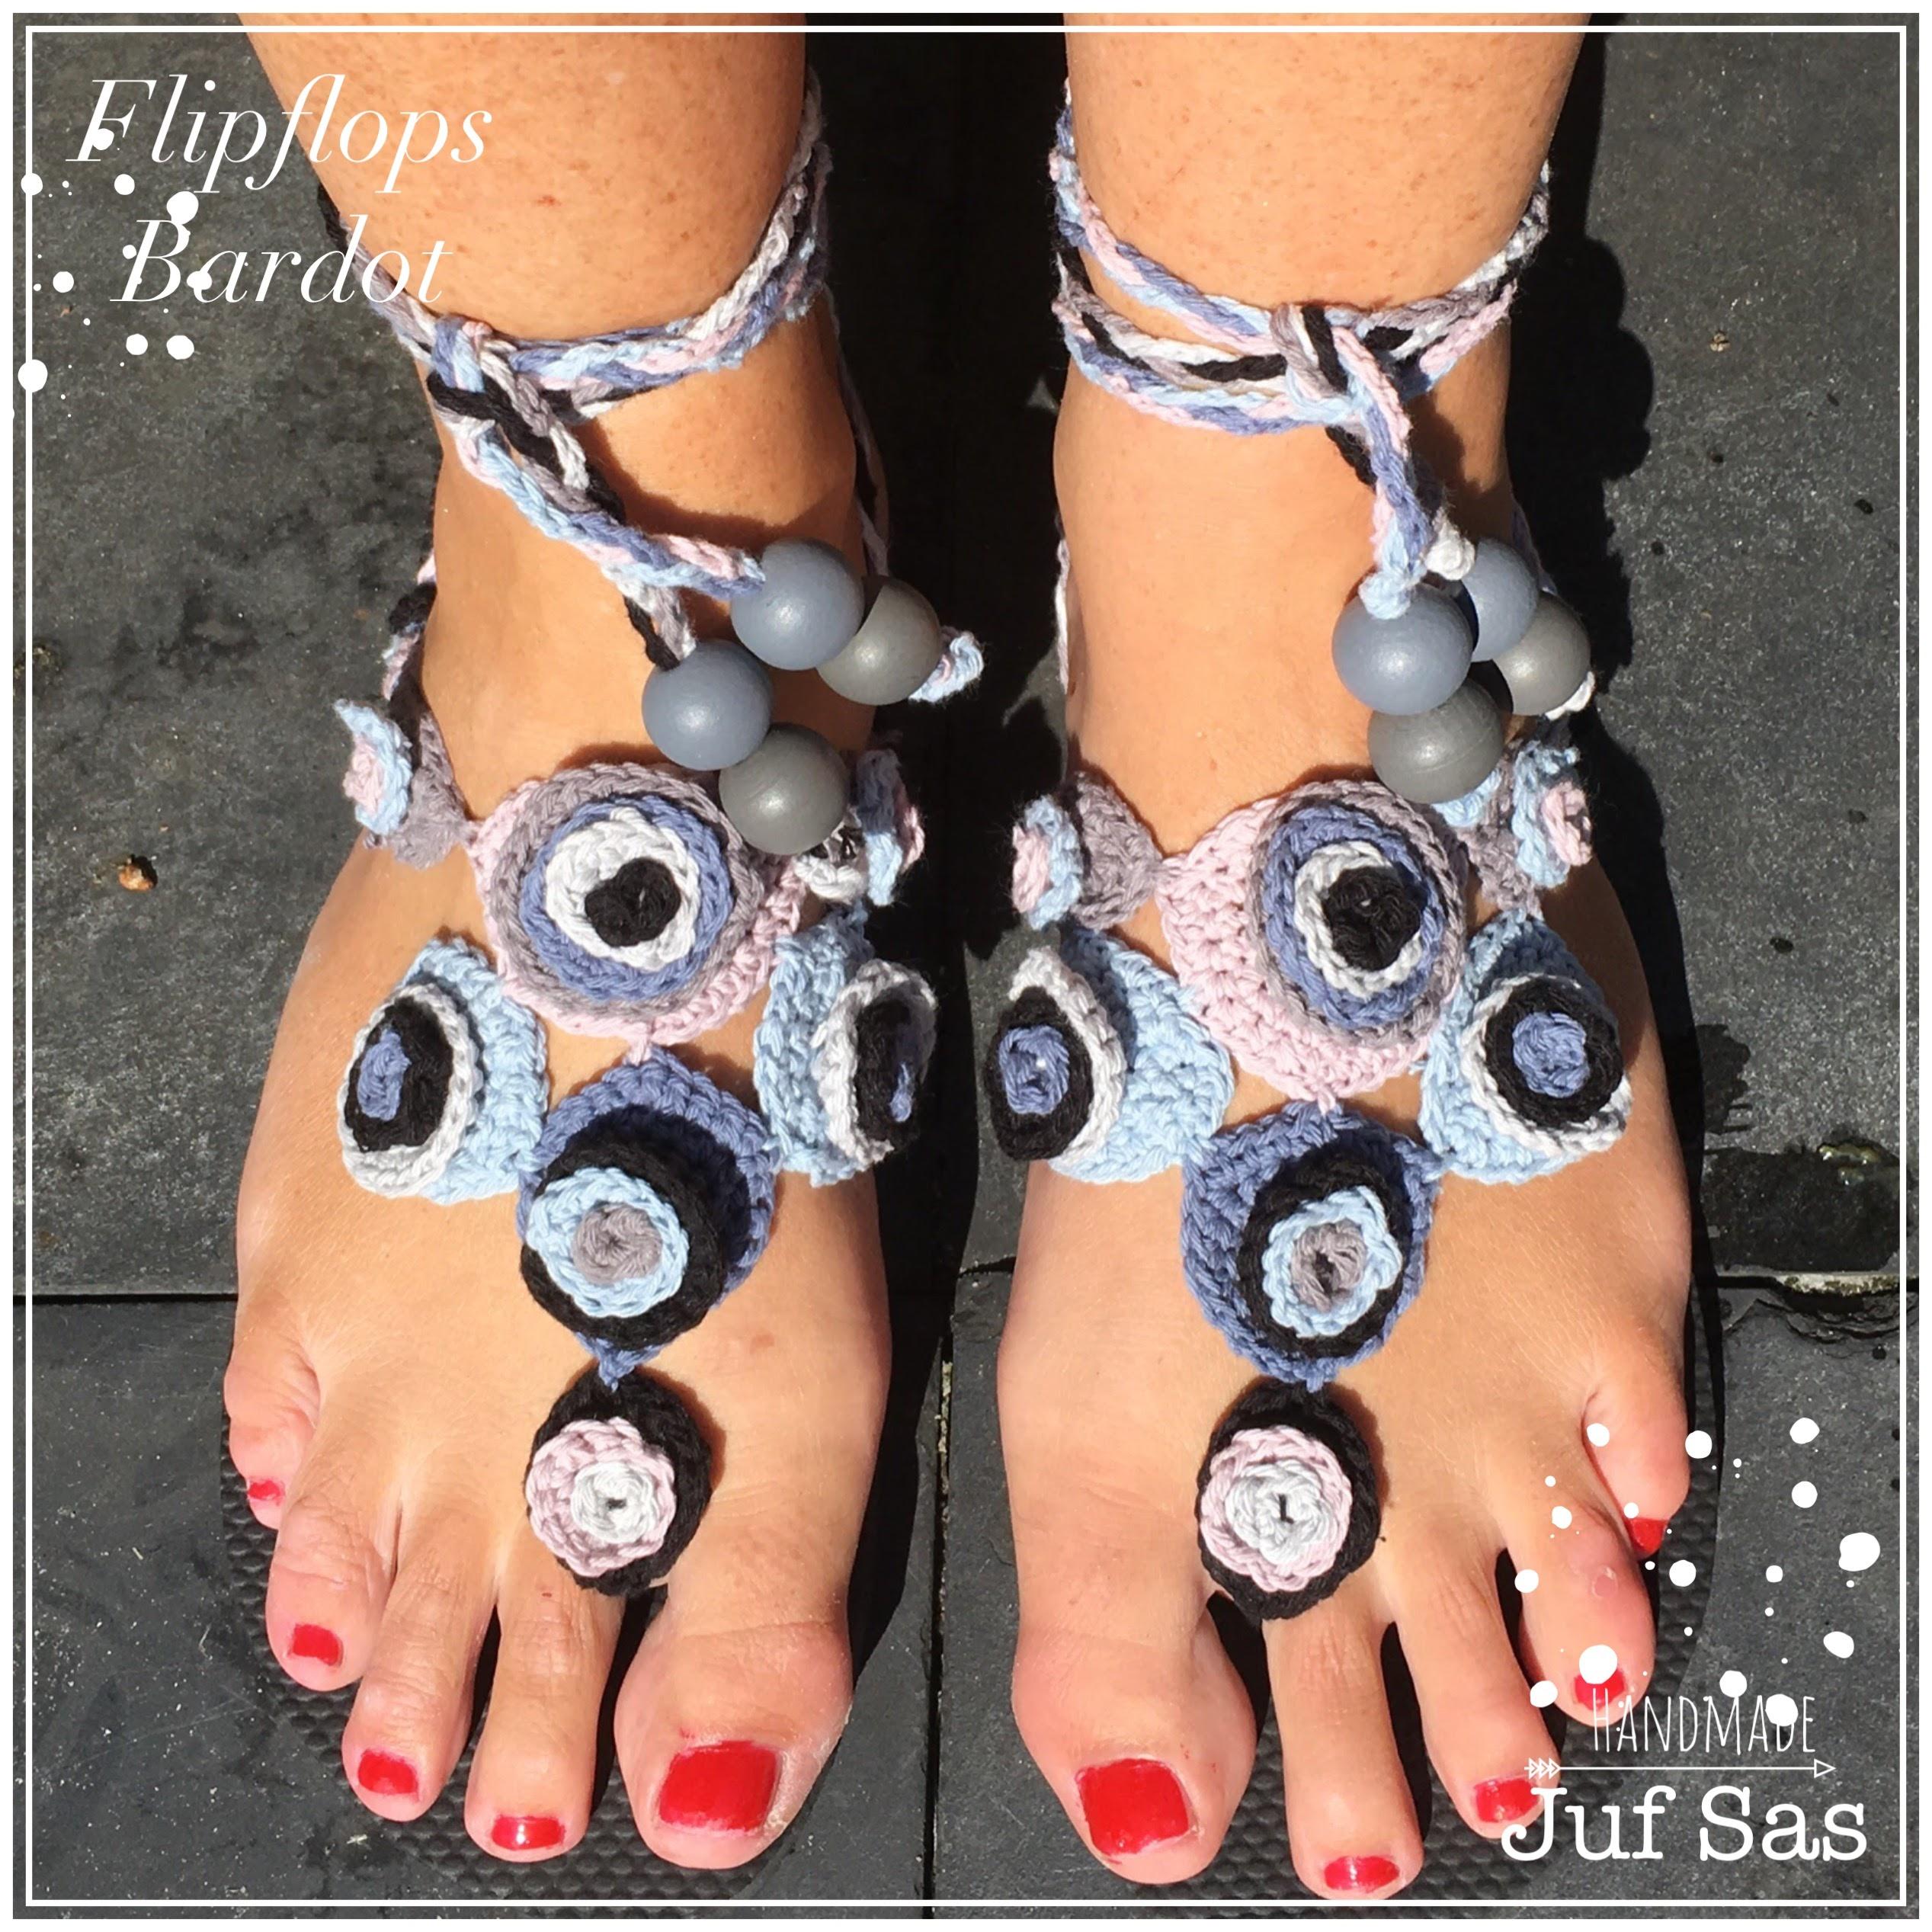 Flipflops Bardot